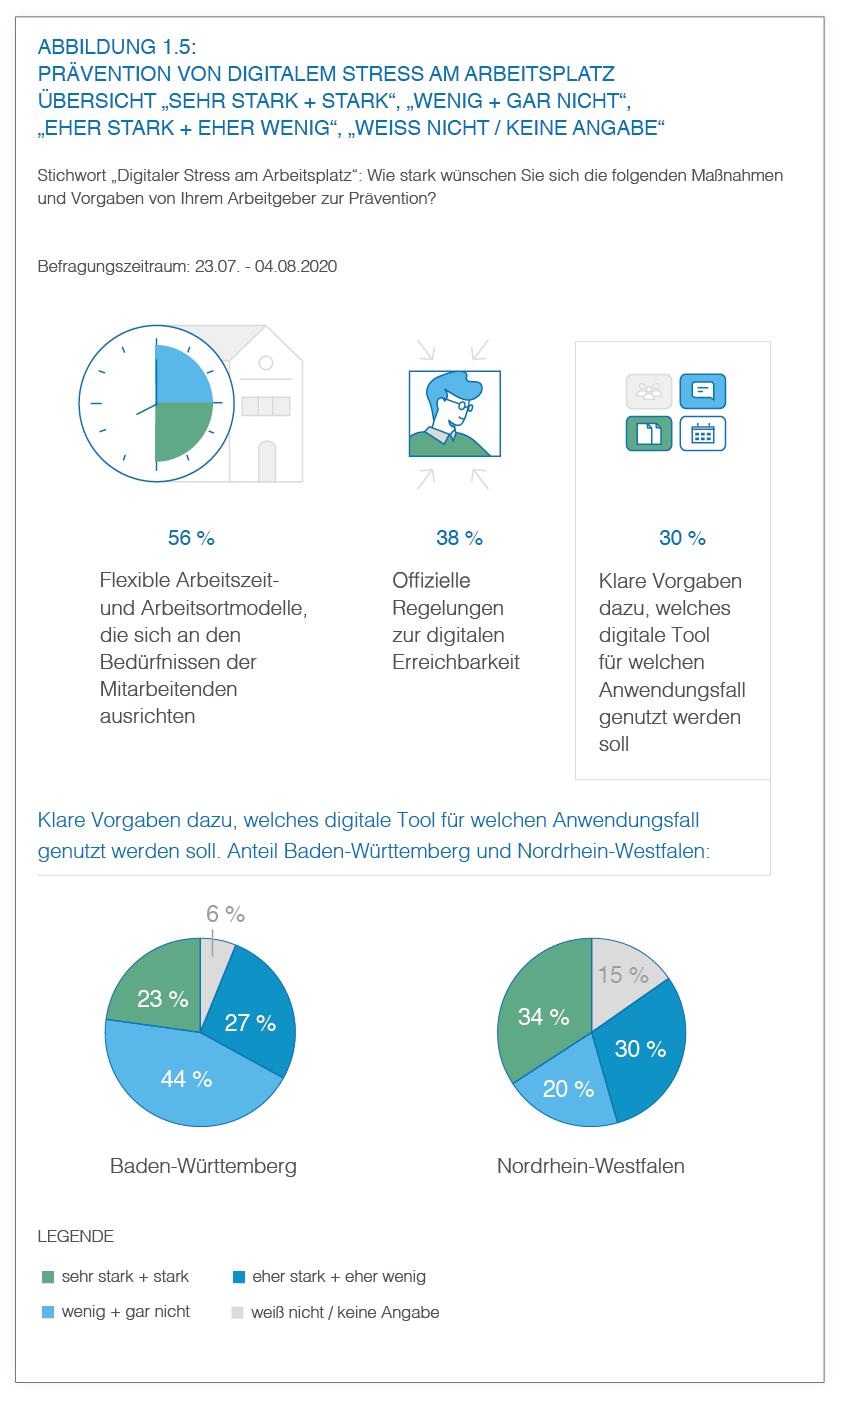 Abbildung 1.5 - Prävention von digitalem Stress am Arbeitsplatz | HIRSCHTEC